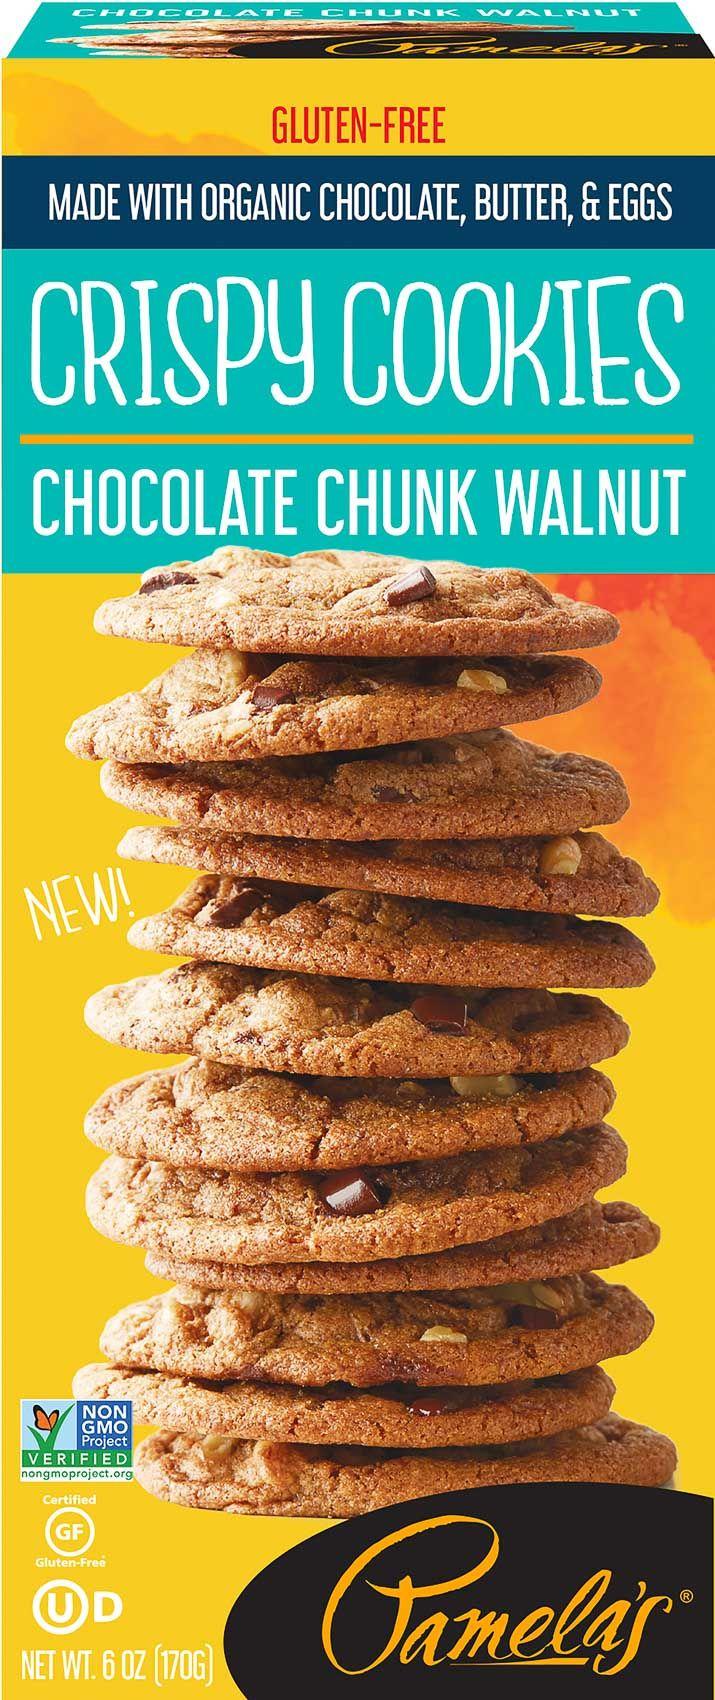 Pamelas_crispy_cookies_chocolate_walnut_chunk.jpg